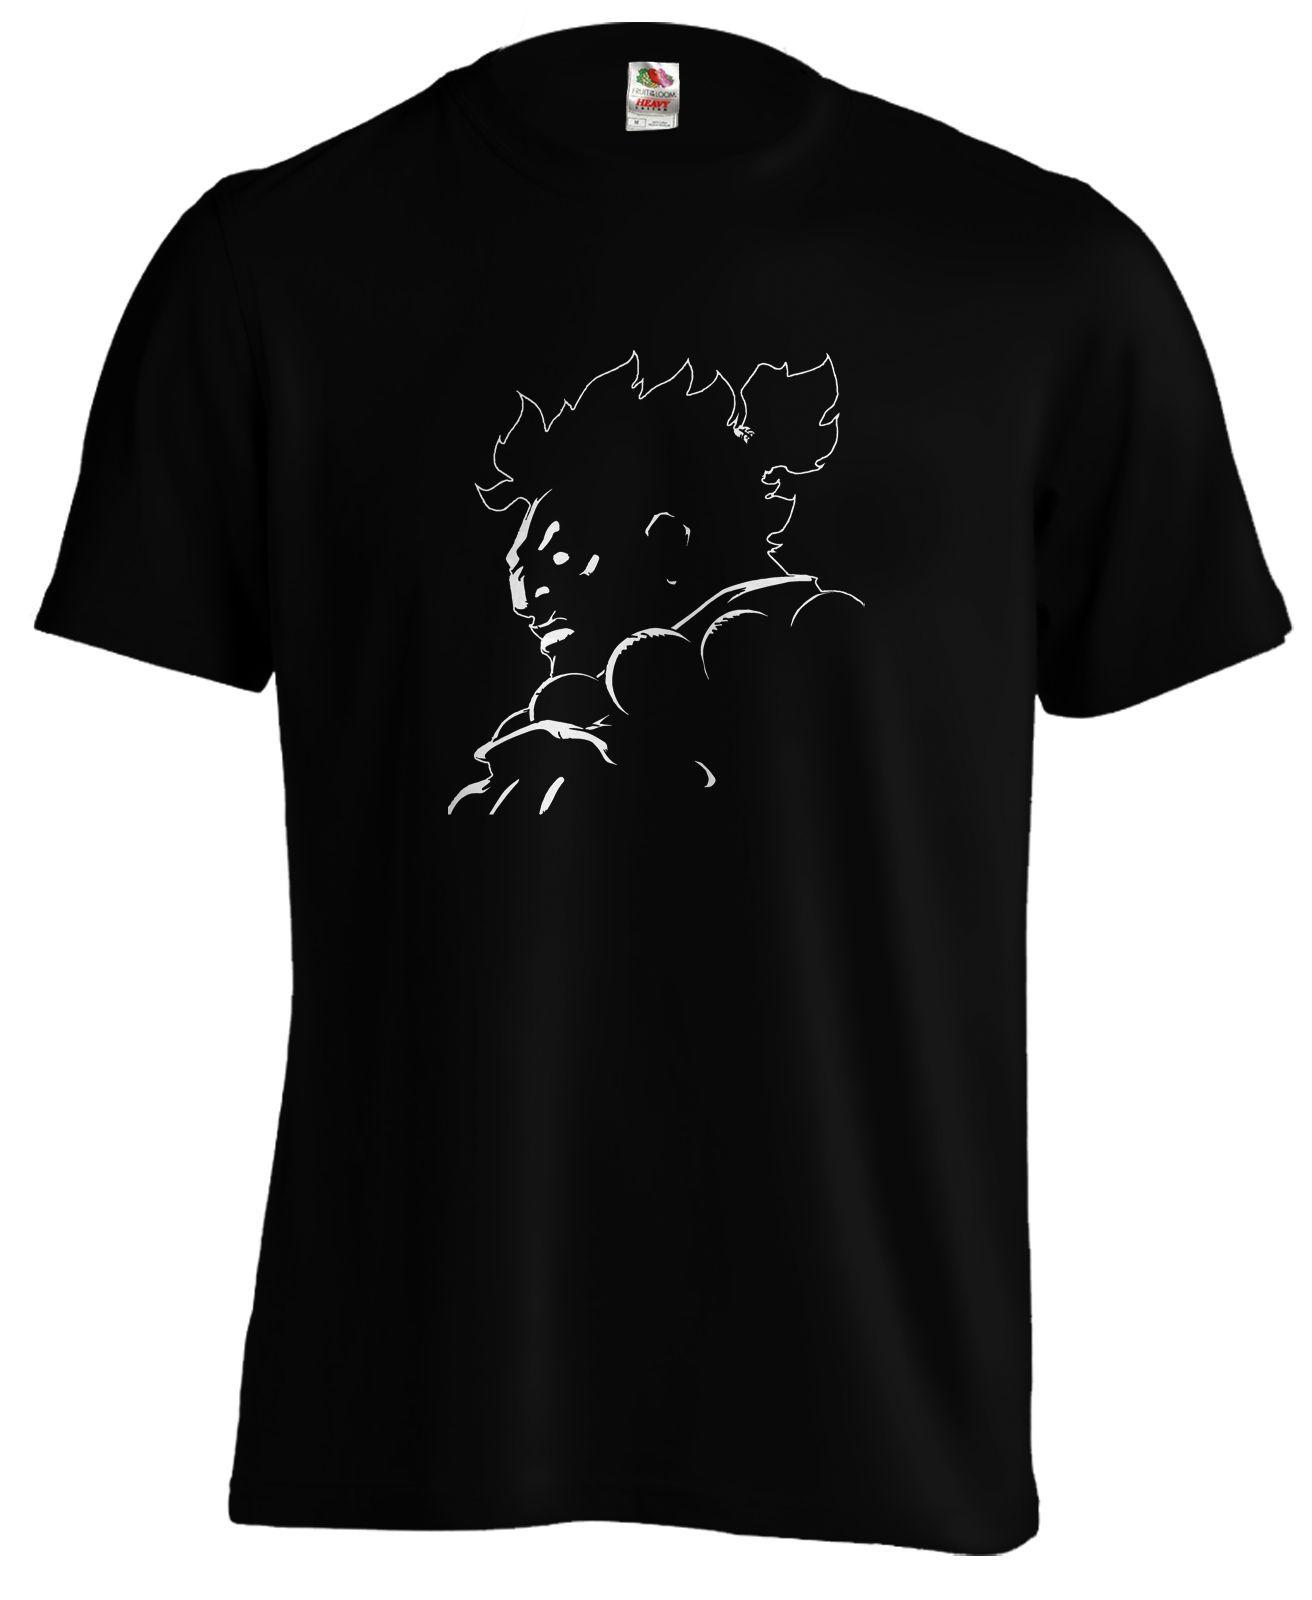 Akuma Dark Hadou Street Fighter V 5 Videogames Gamer Anime Manga T shirt Tee